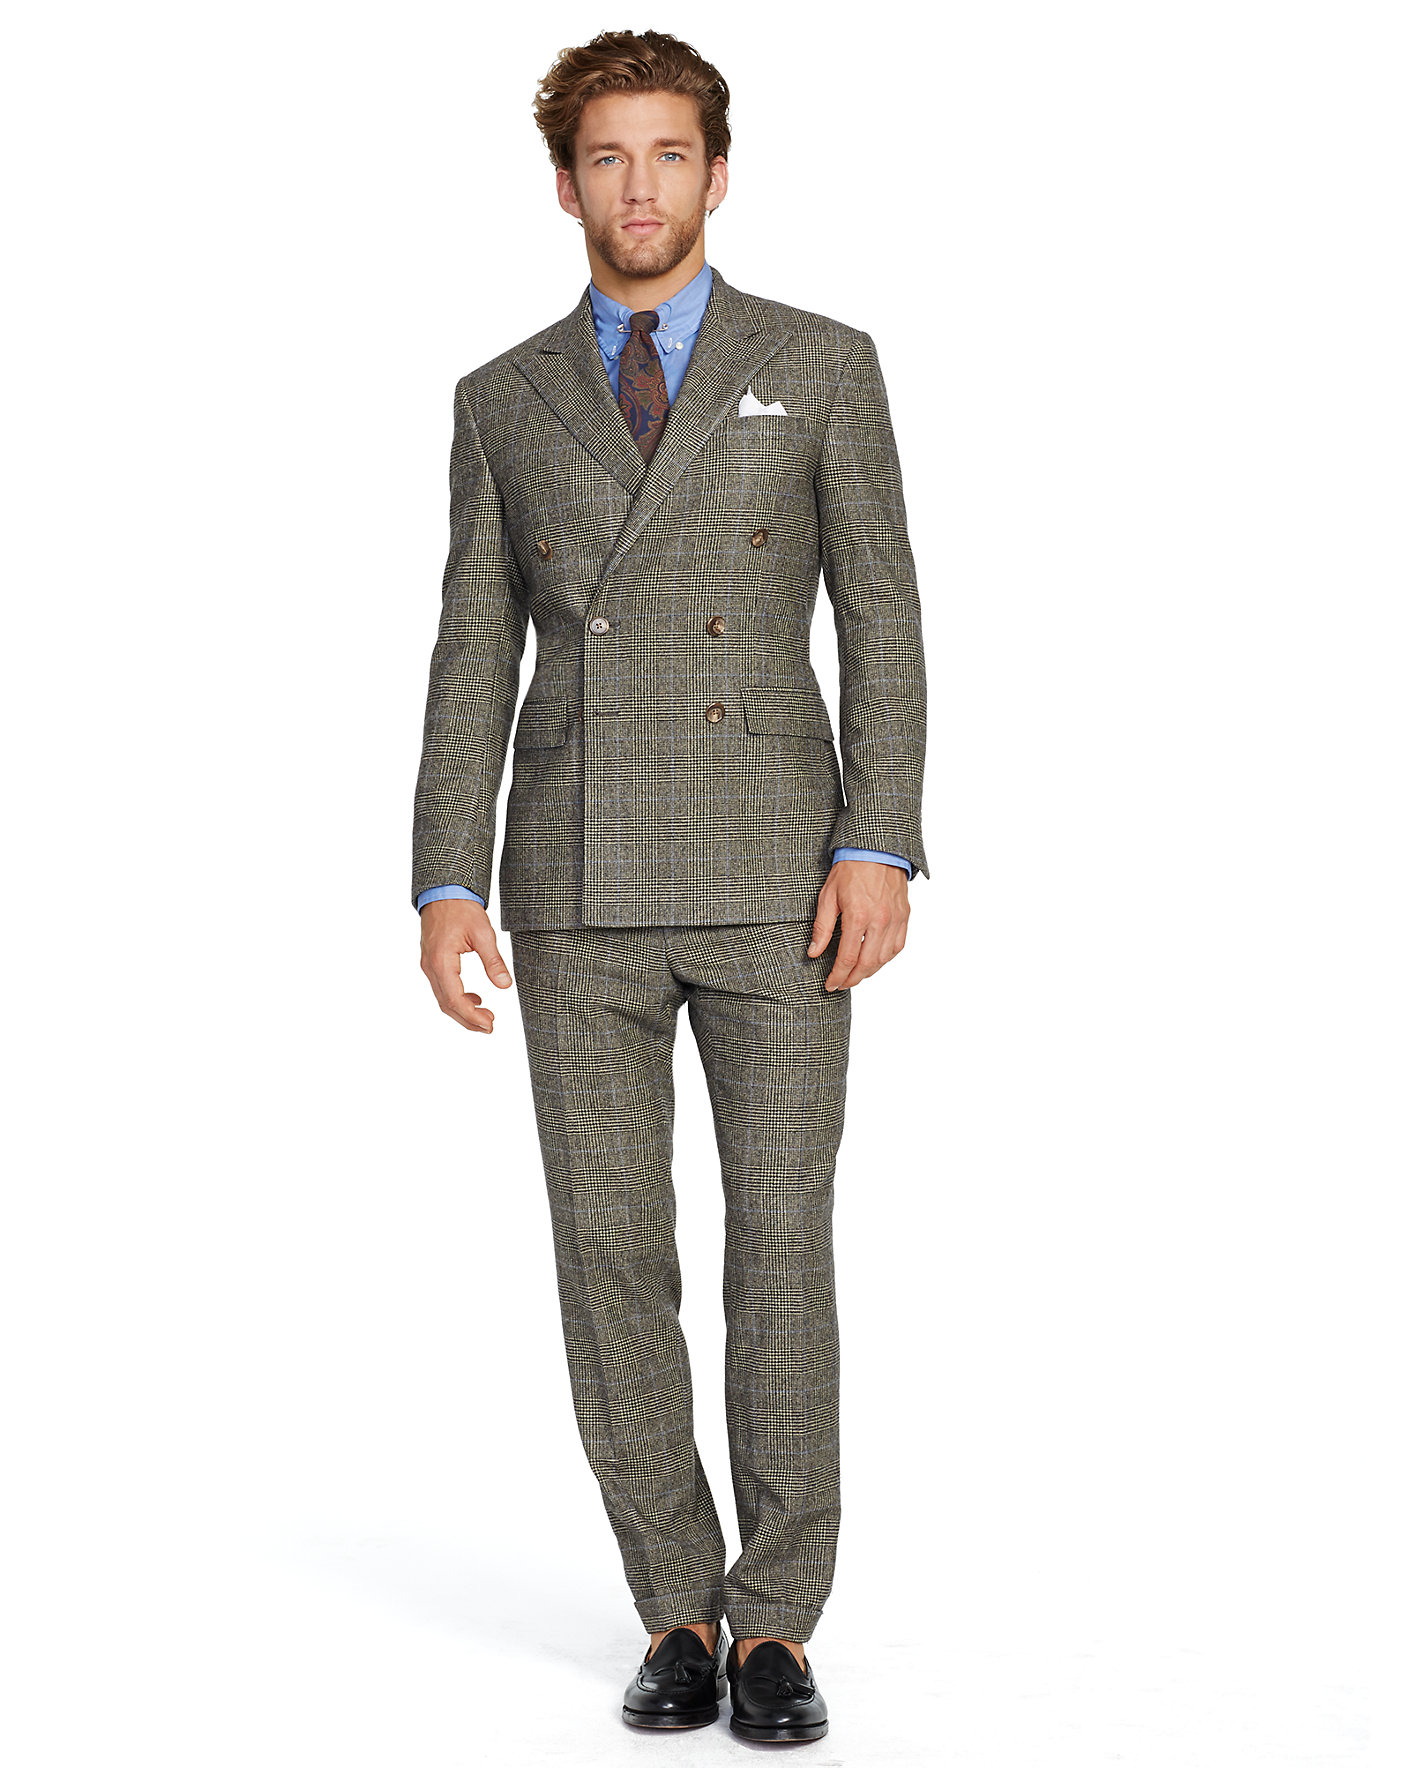 Ralph Lauren Latest Mens Fashion Suits Party Wear Formal Dresses Collection 2014-2015 (9)